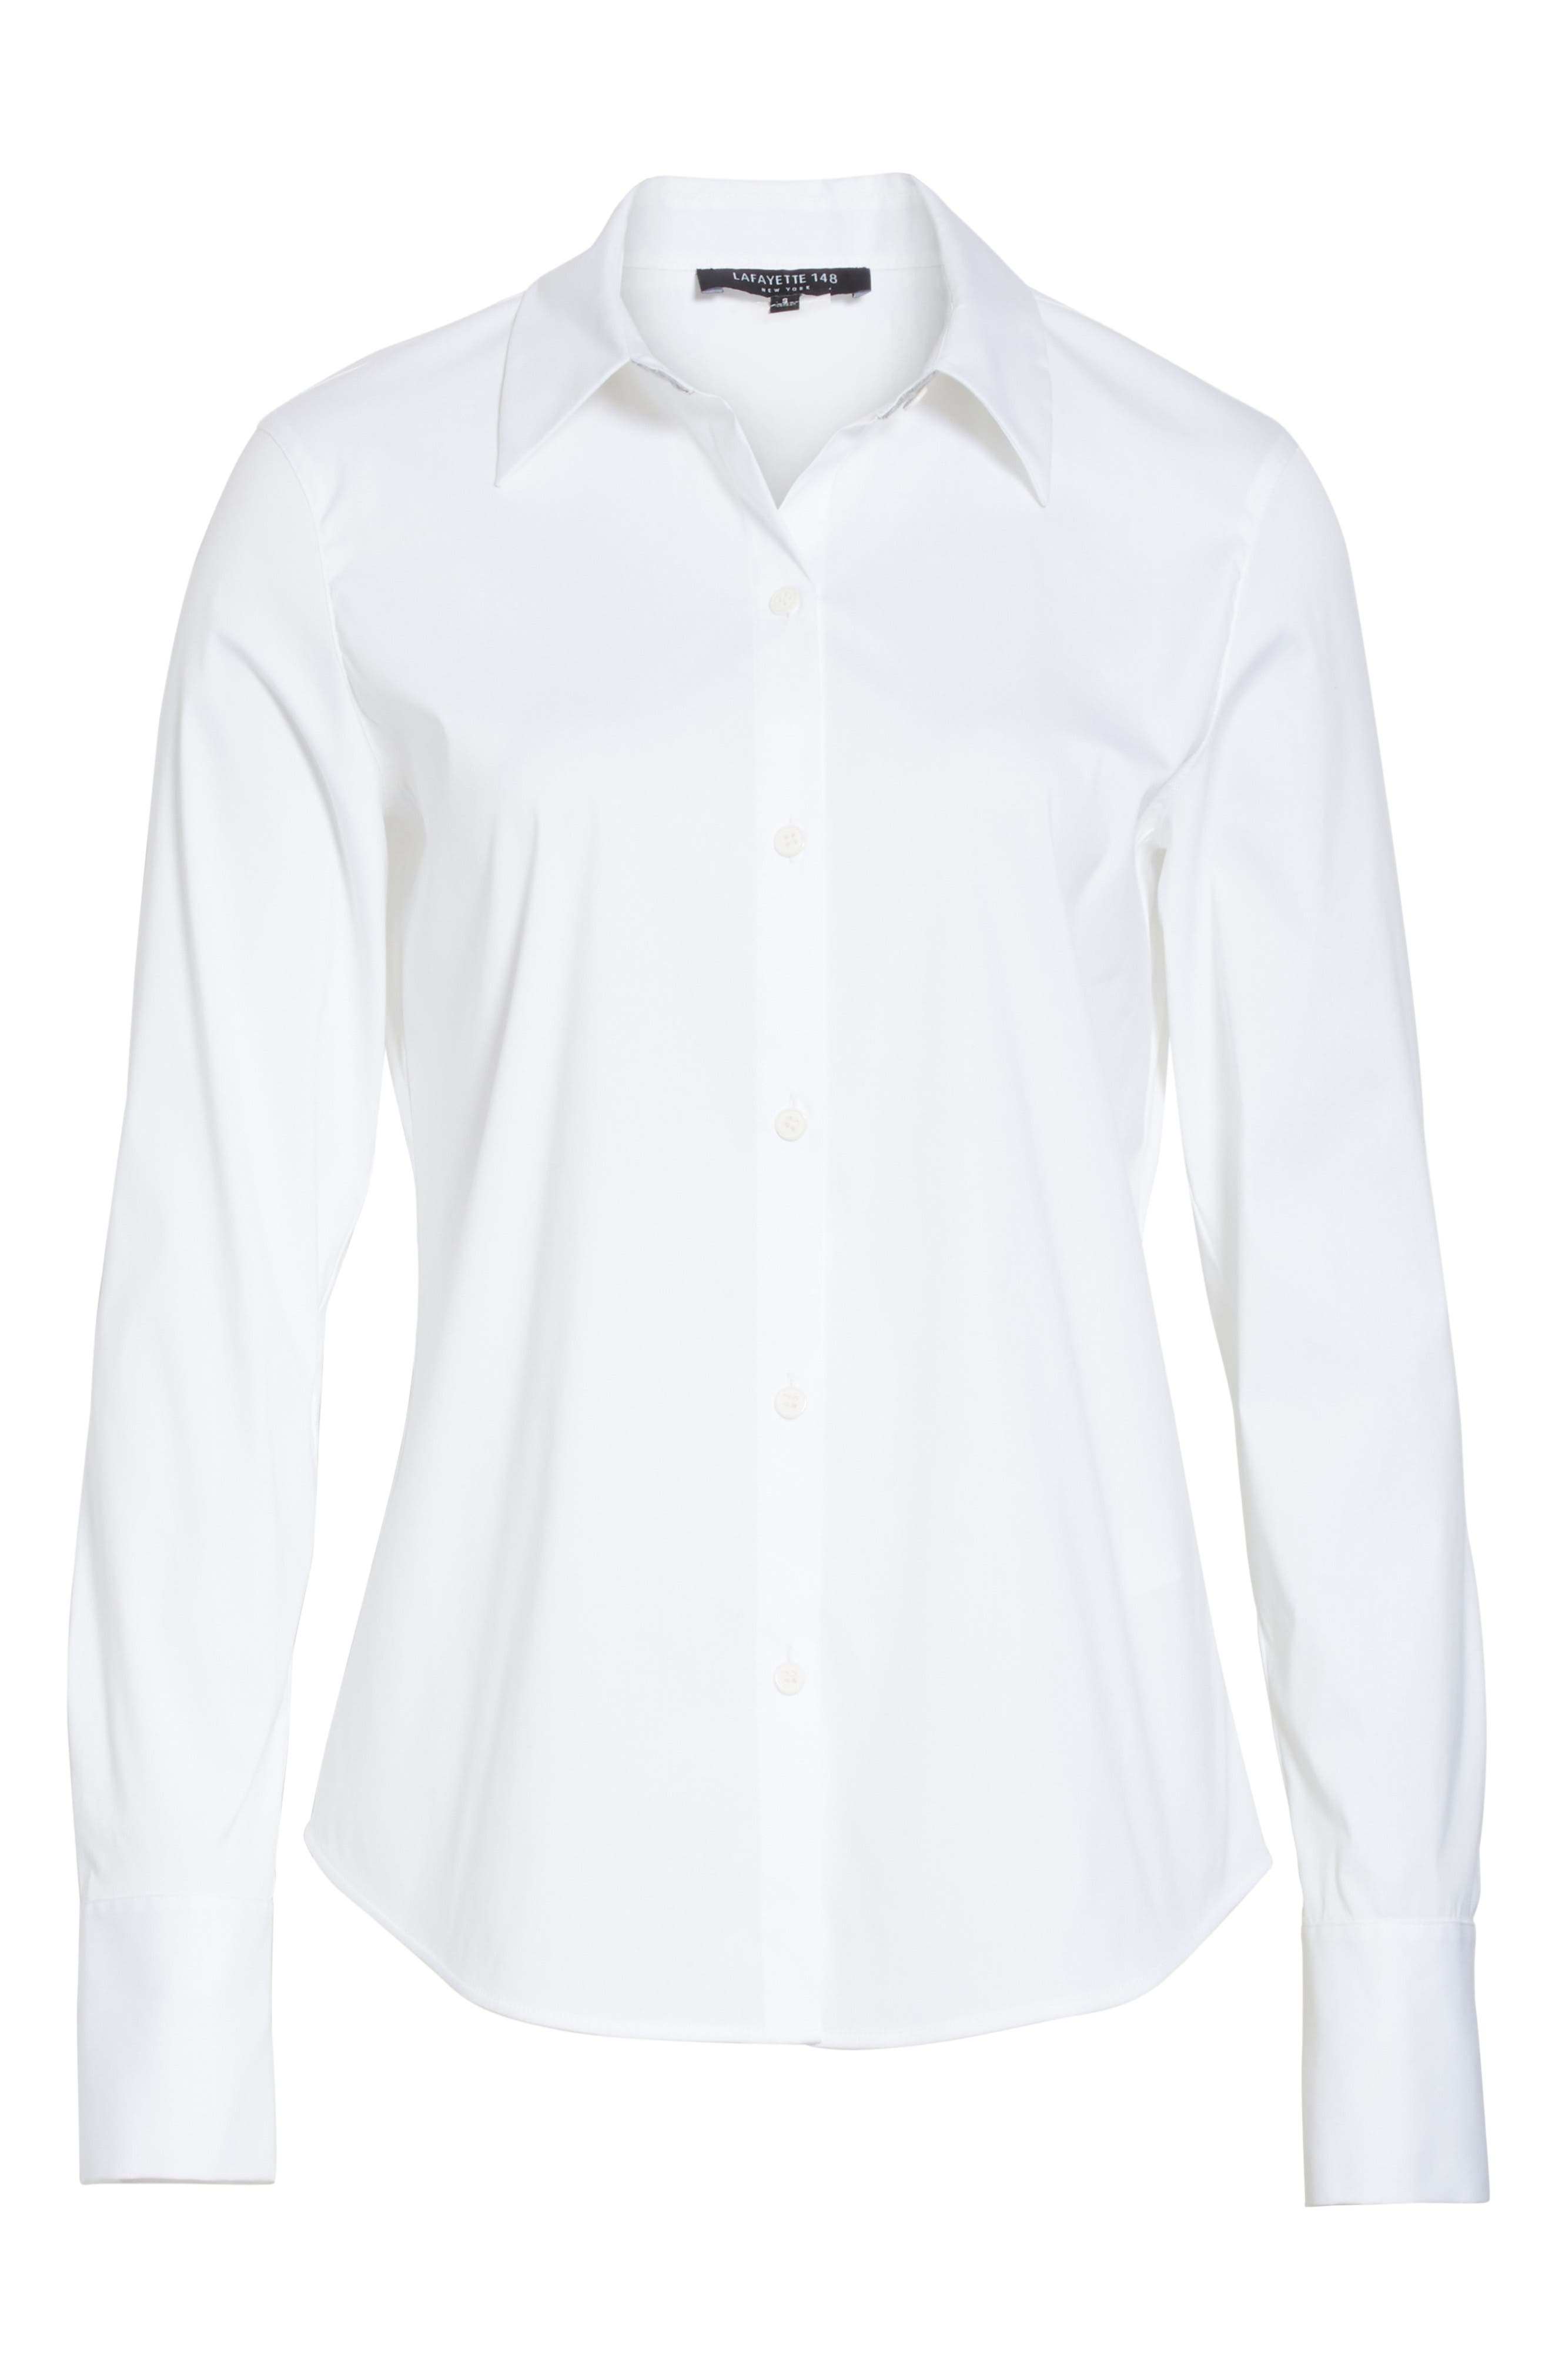 Linley Stretch Cotton Blouse,                             Alternate thumbnail 6, color,                             WHITE